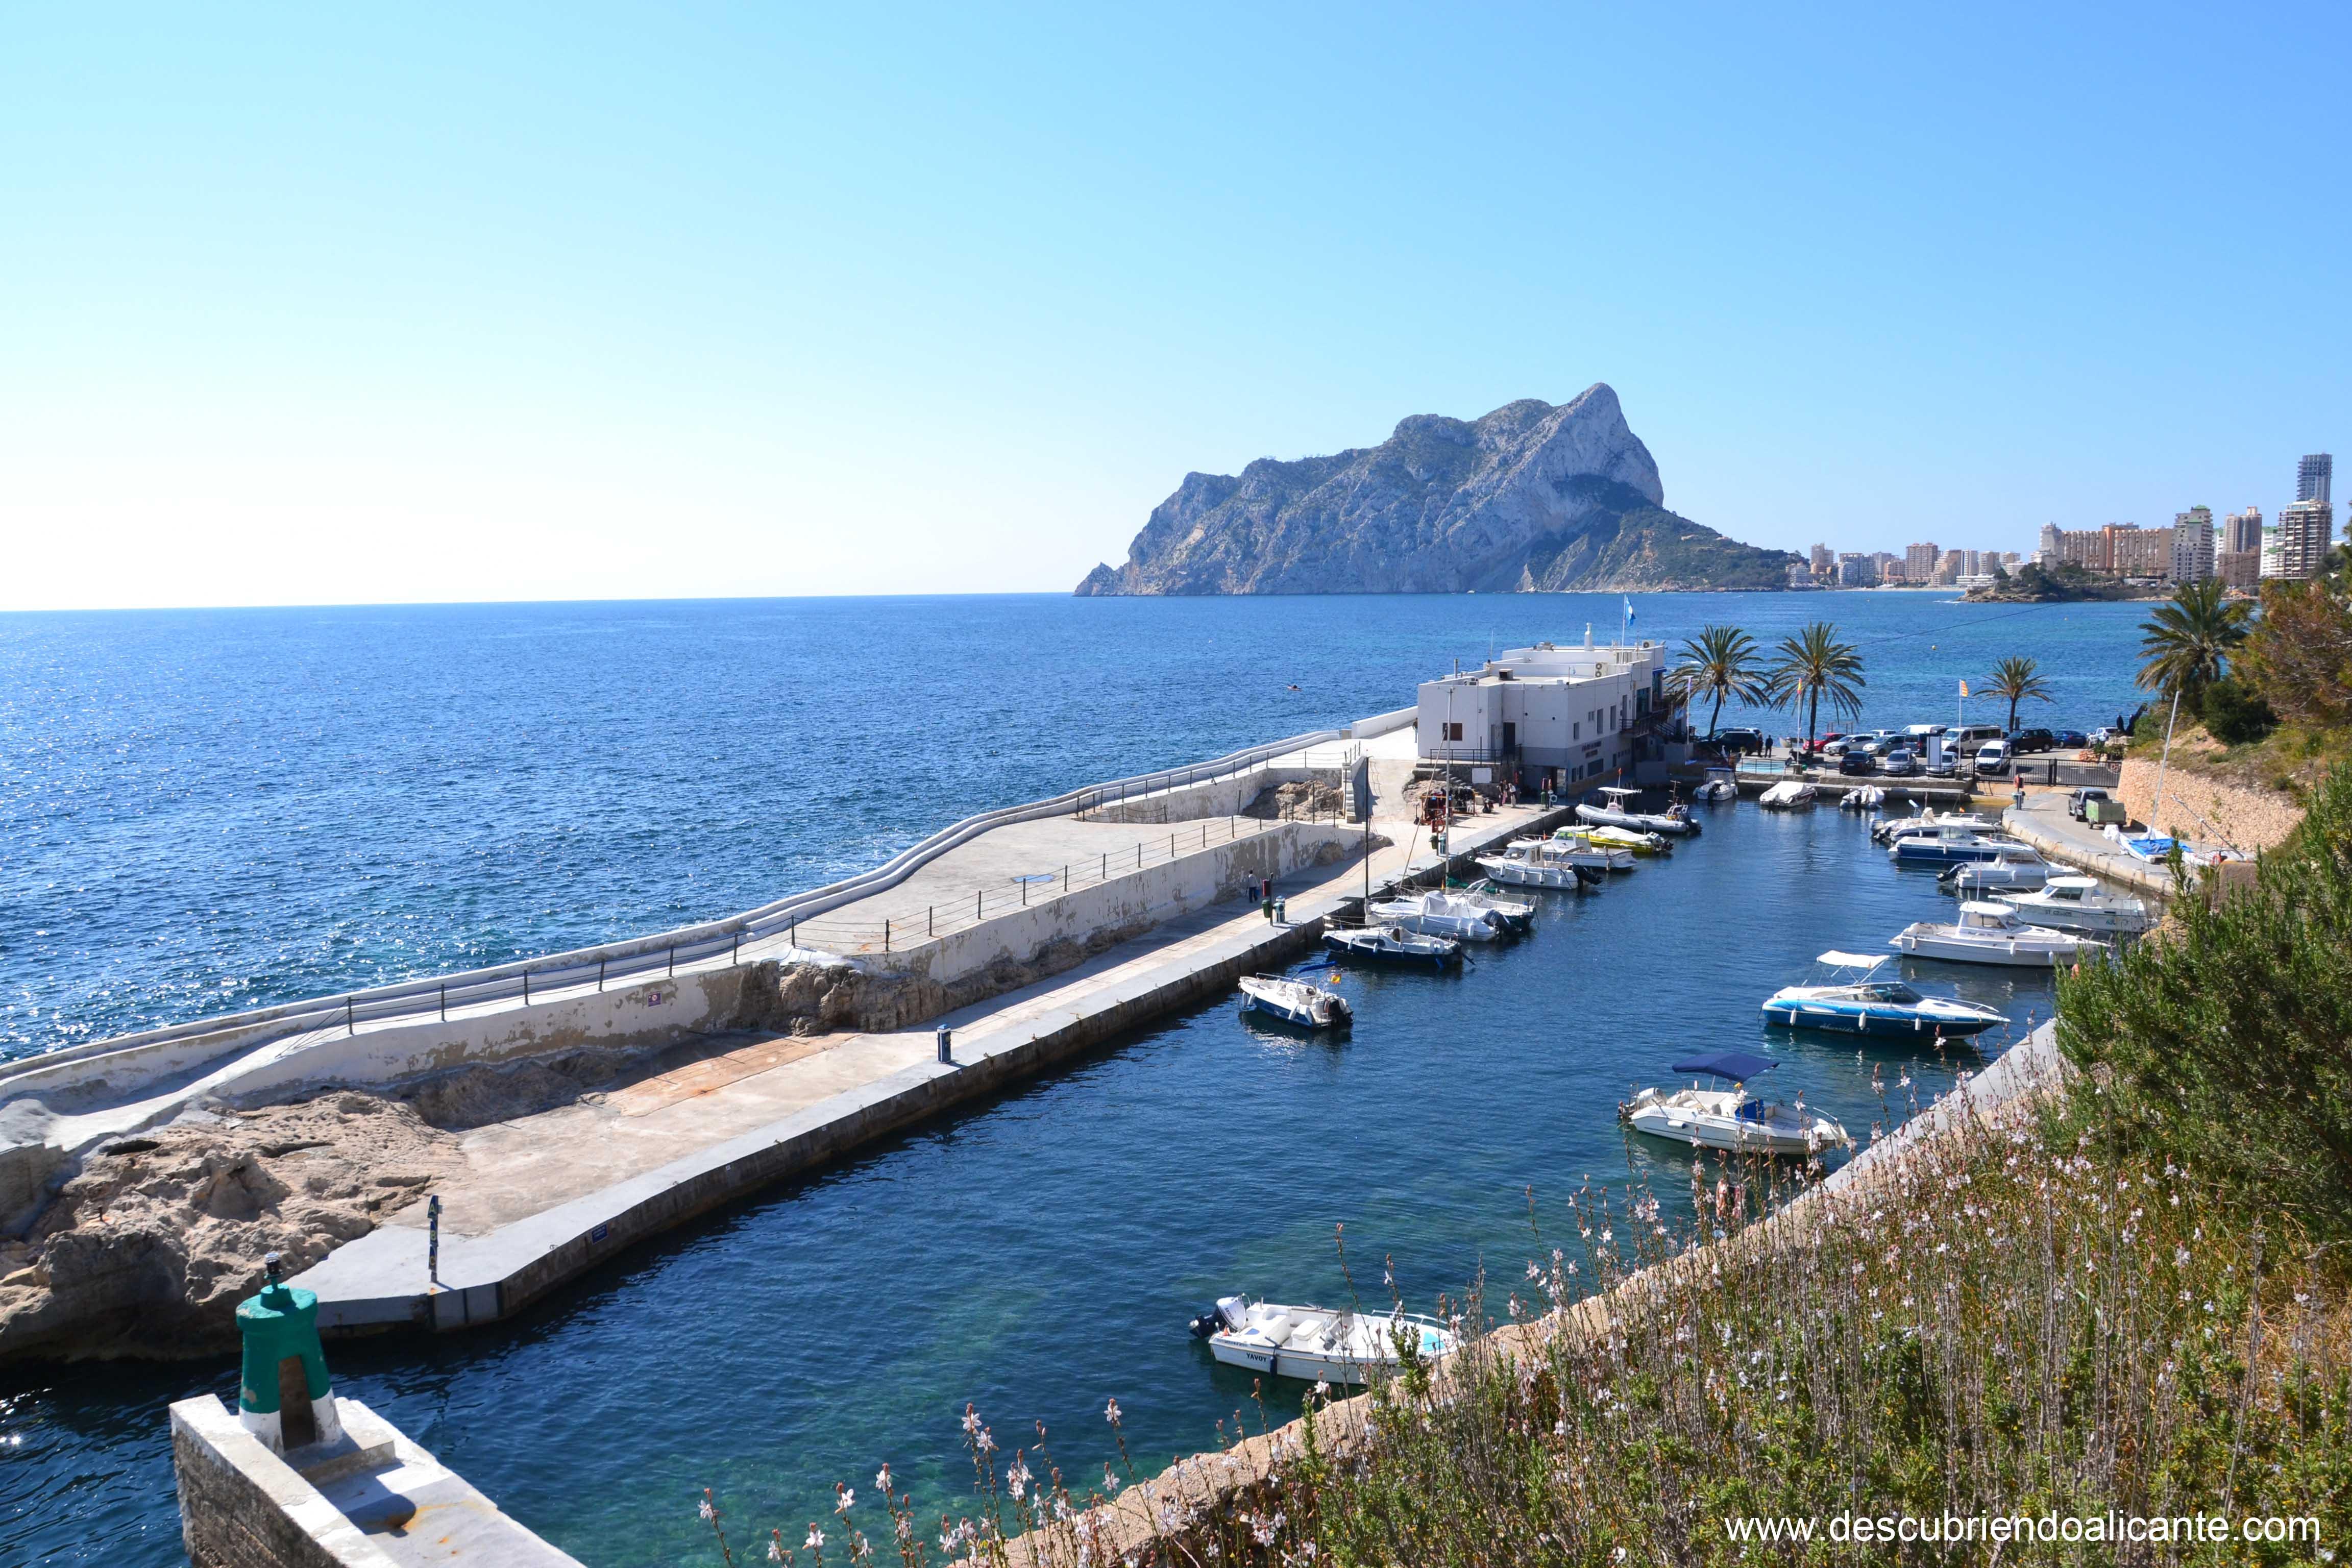 909-paseo-ecologico-benissa-sur-club-nautico-bassetes